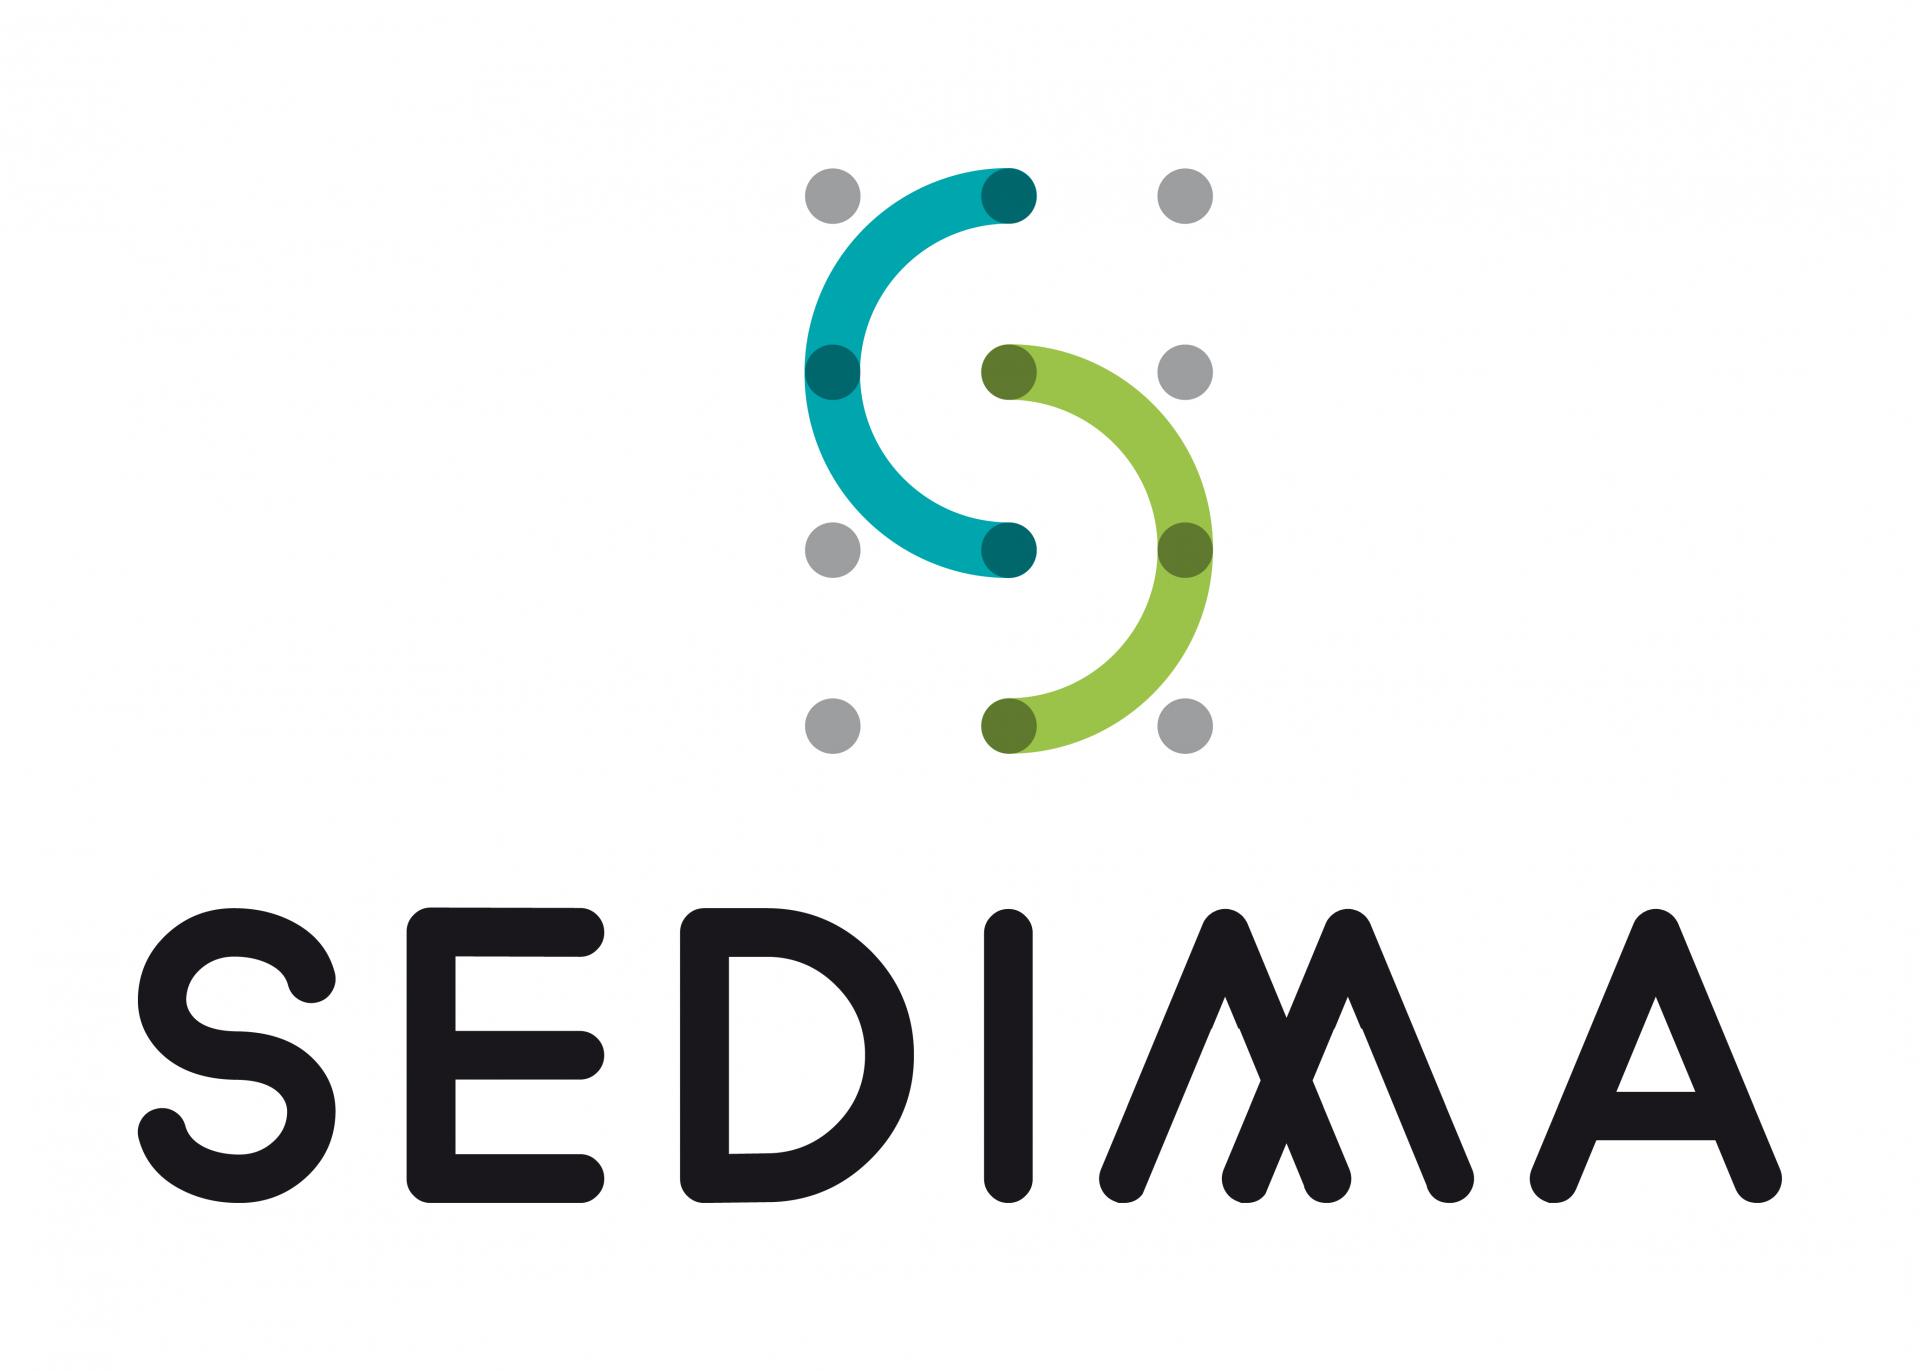 SEDIMA-logo.jpg